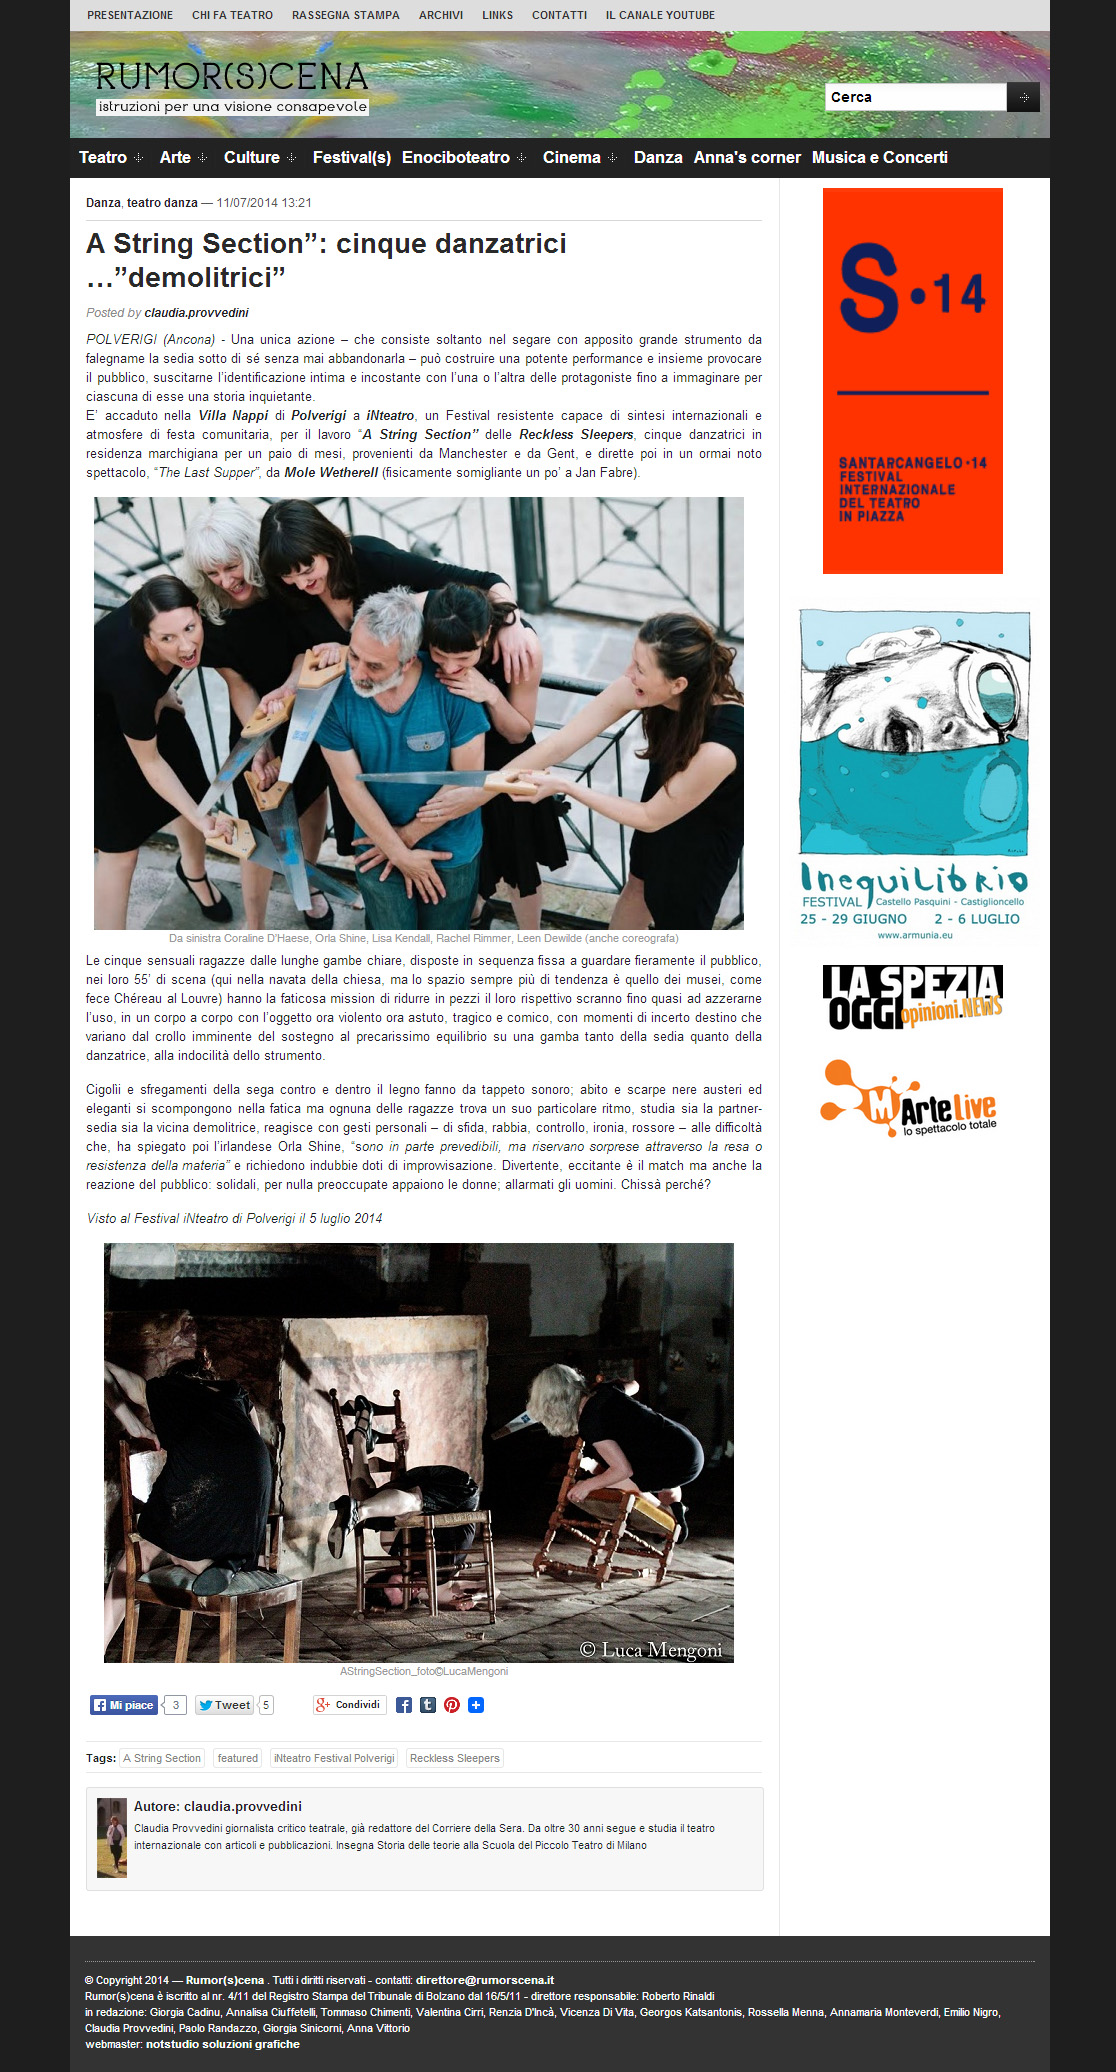 2014.07.11 A String Section cinque danzatrici 'demolitrici' - rumorscena.com